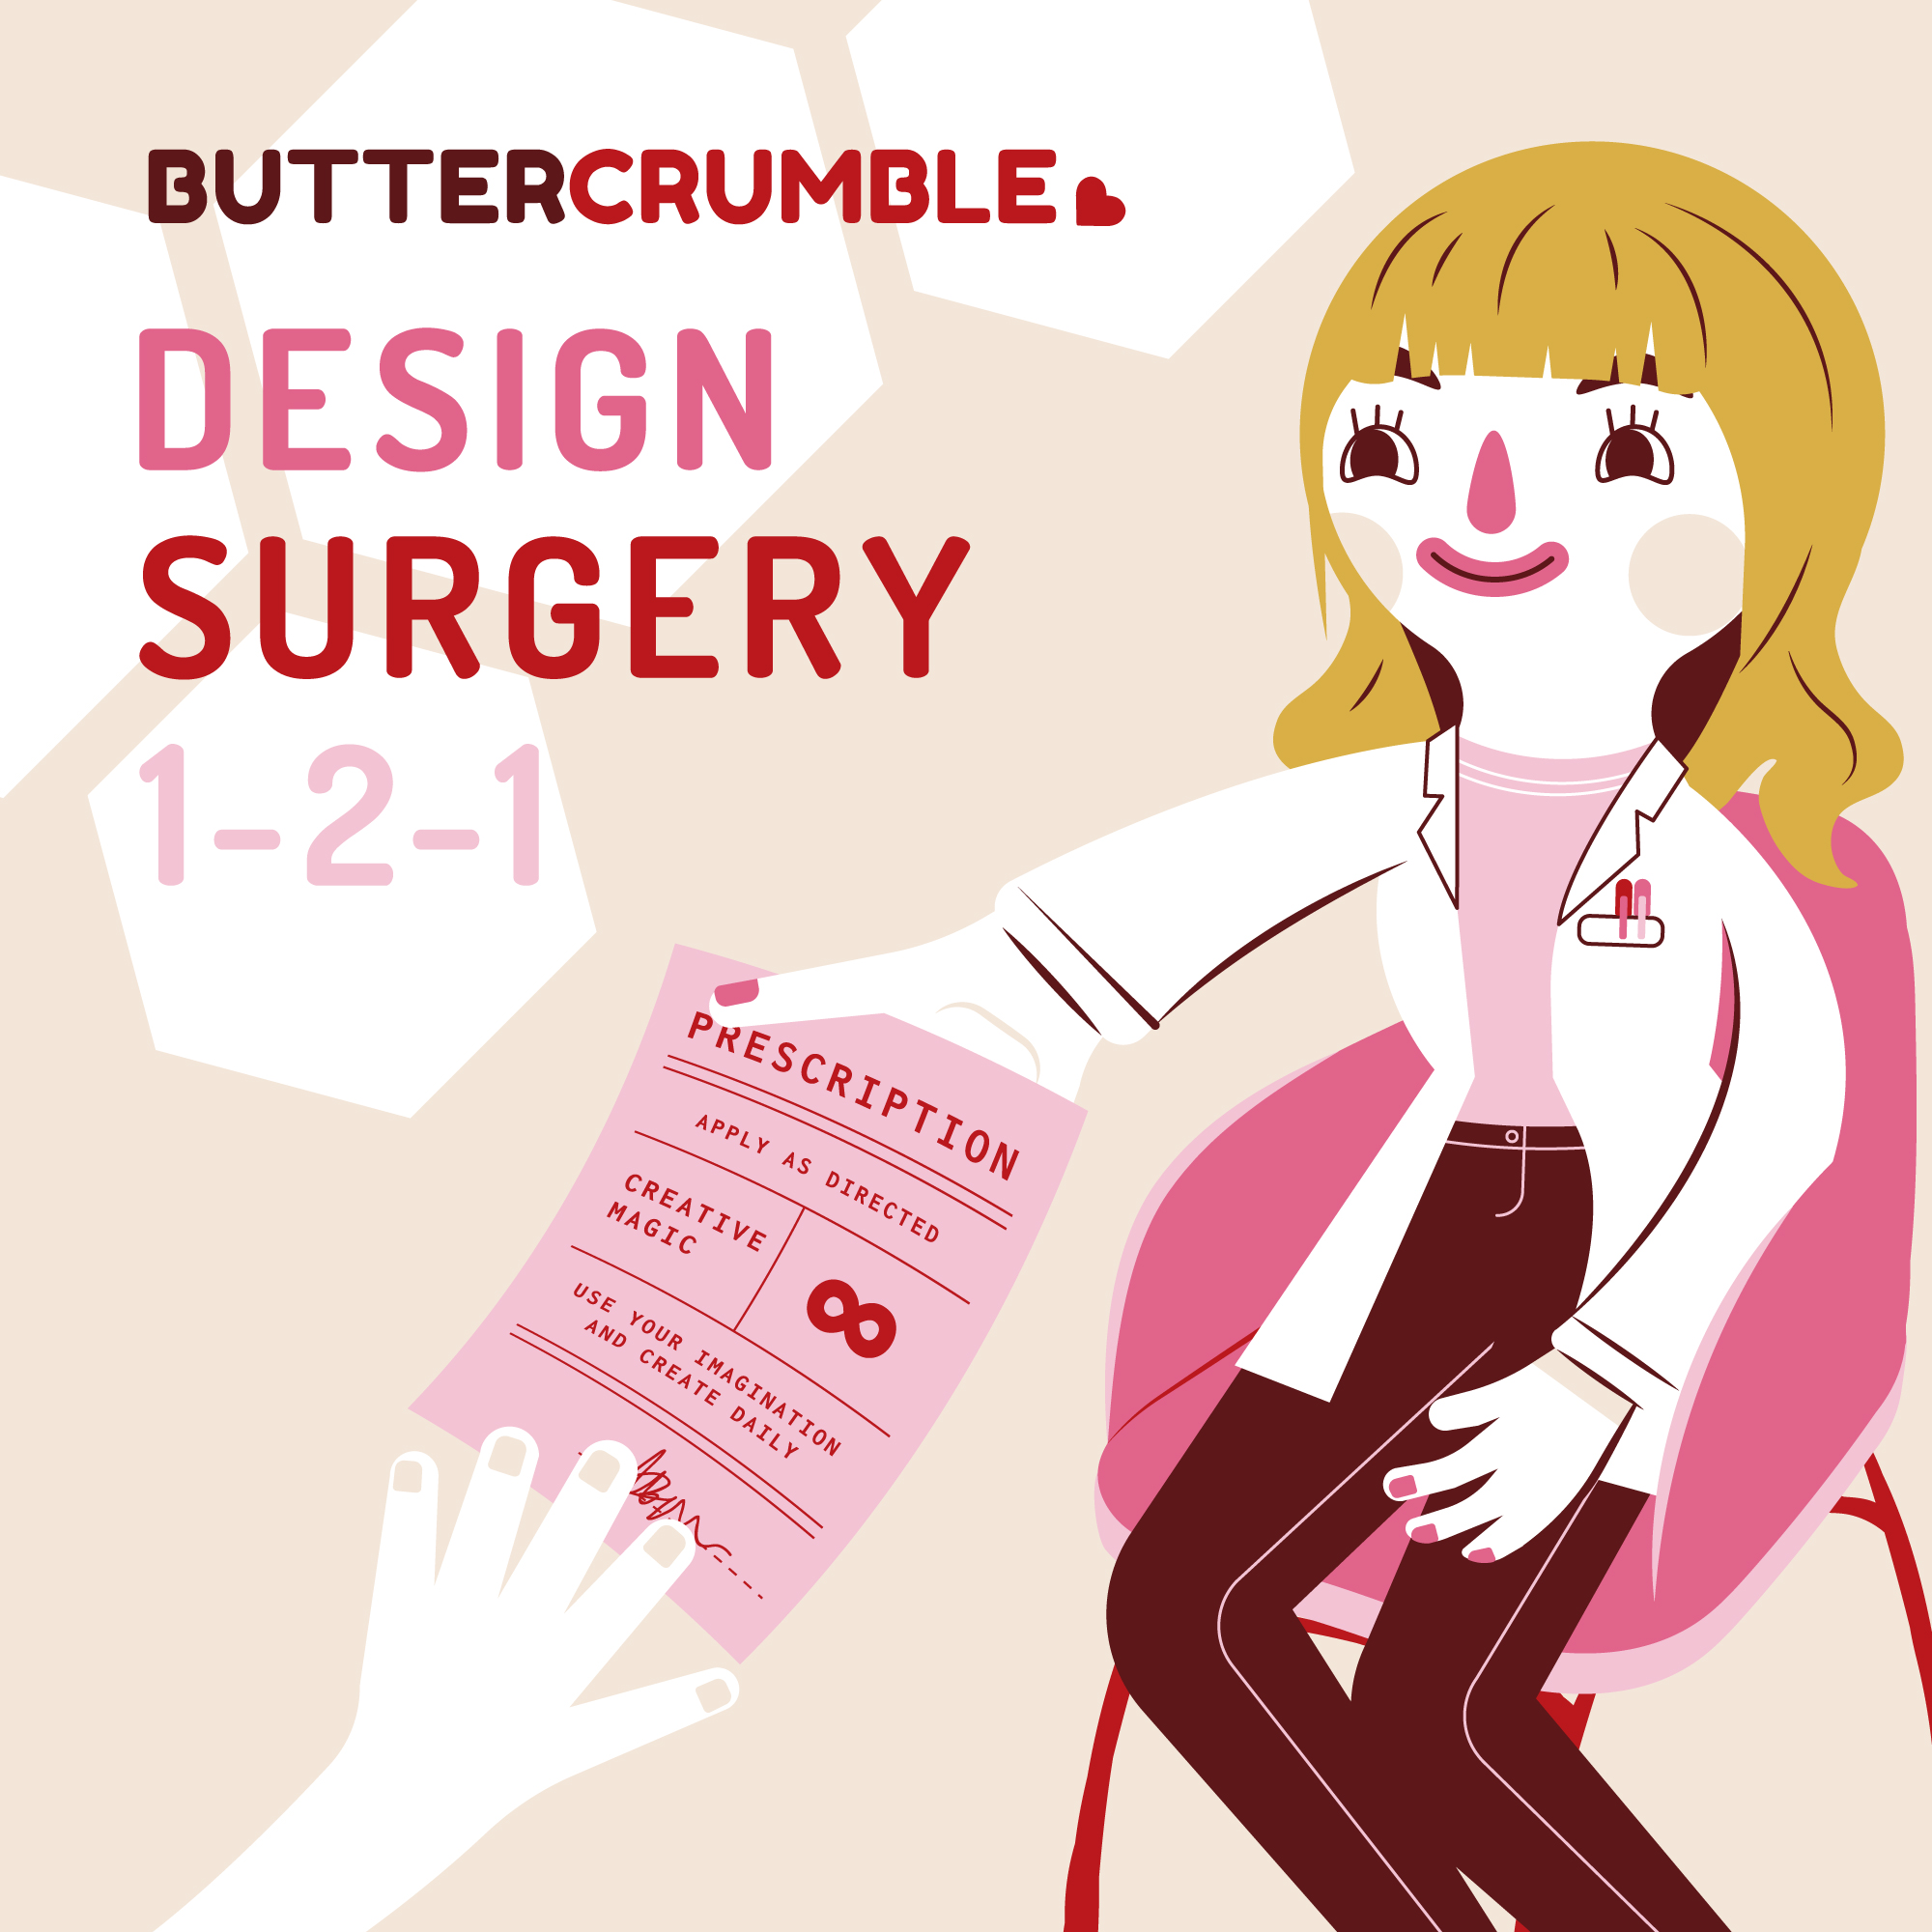 Design-Surgery-1-2-1-Graphic.jpg